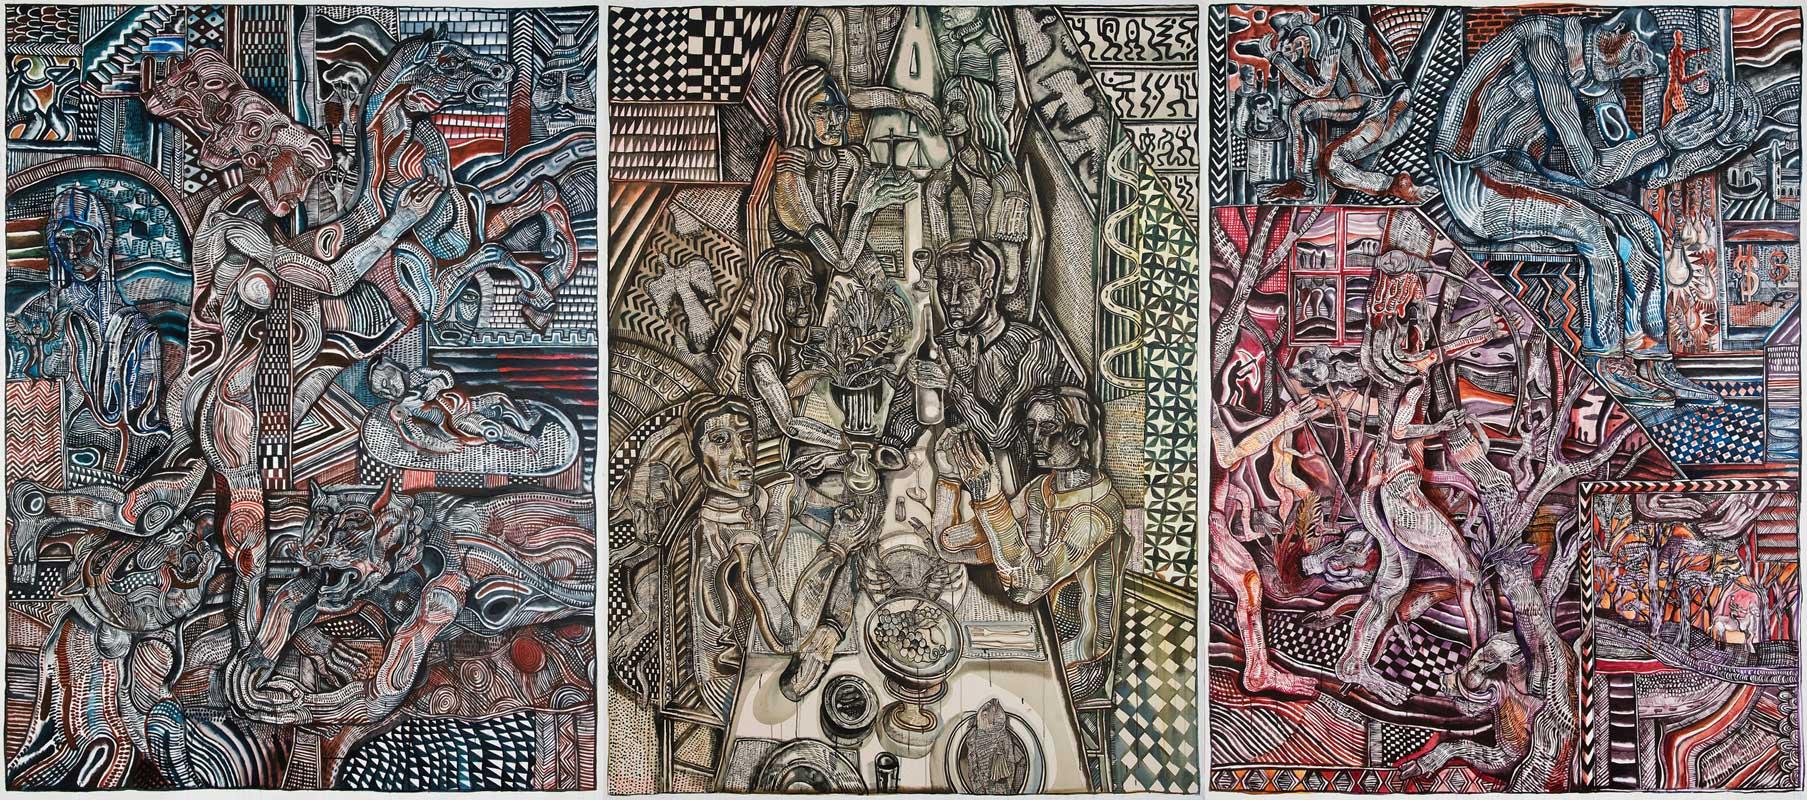 Zio Ziegler, The Senses (triptich), 2015, Mixed Media On Three Canvas, 244x183 Cm (each)